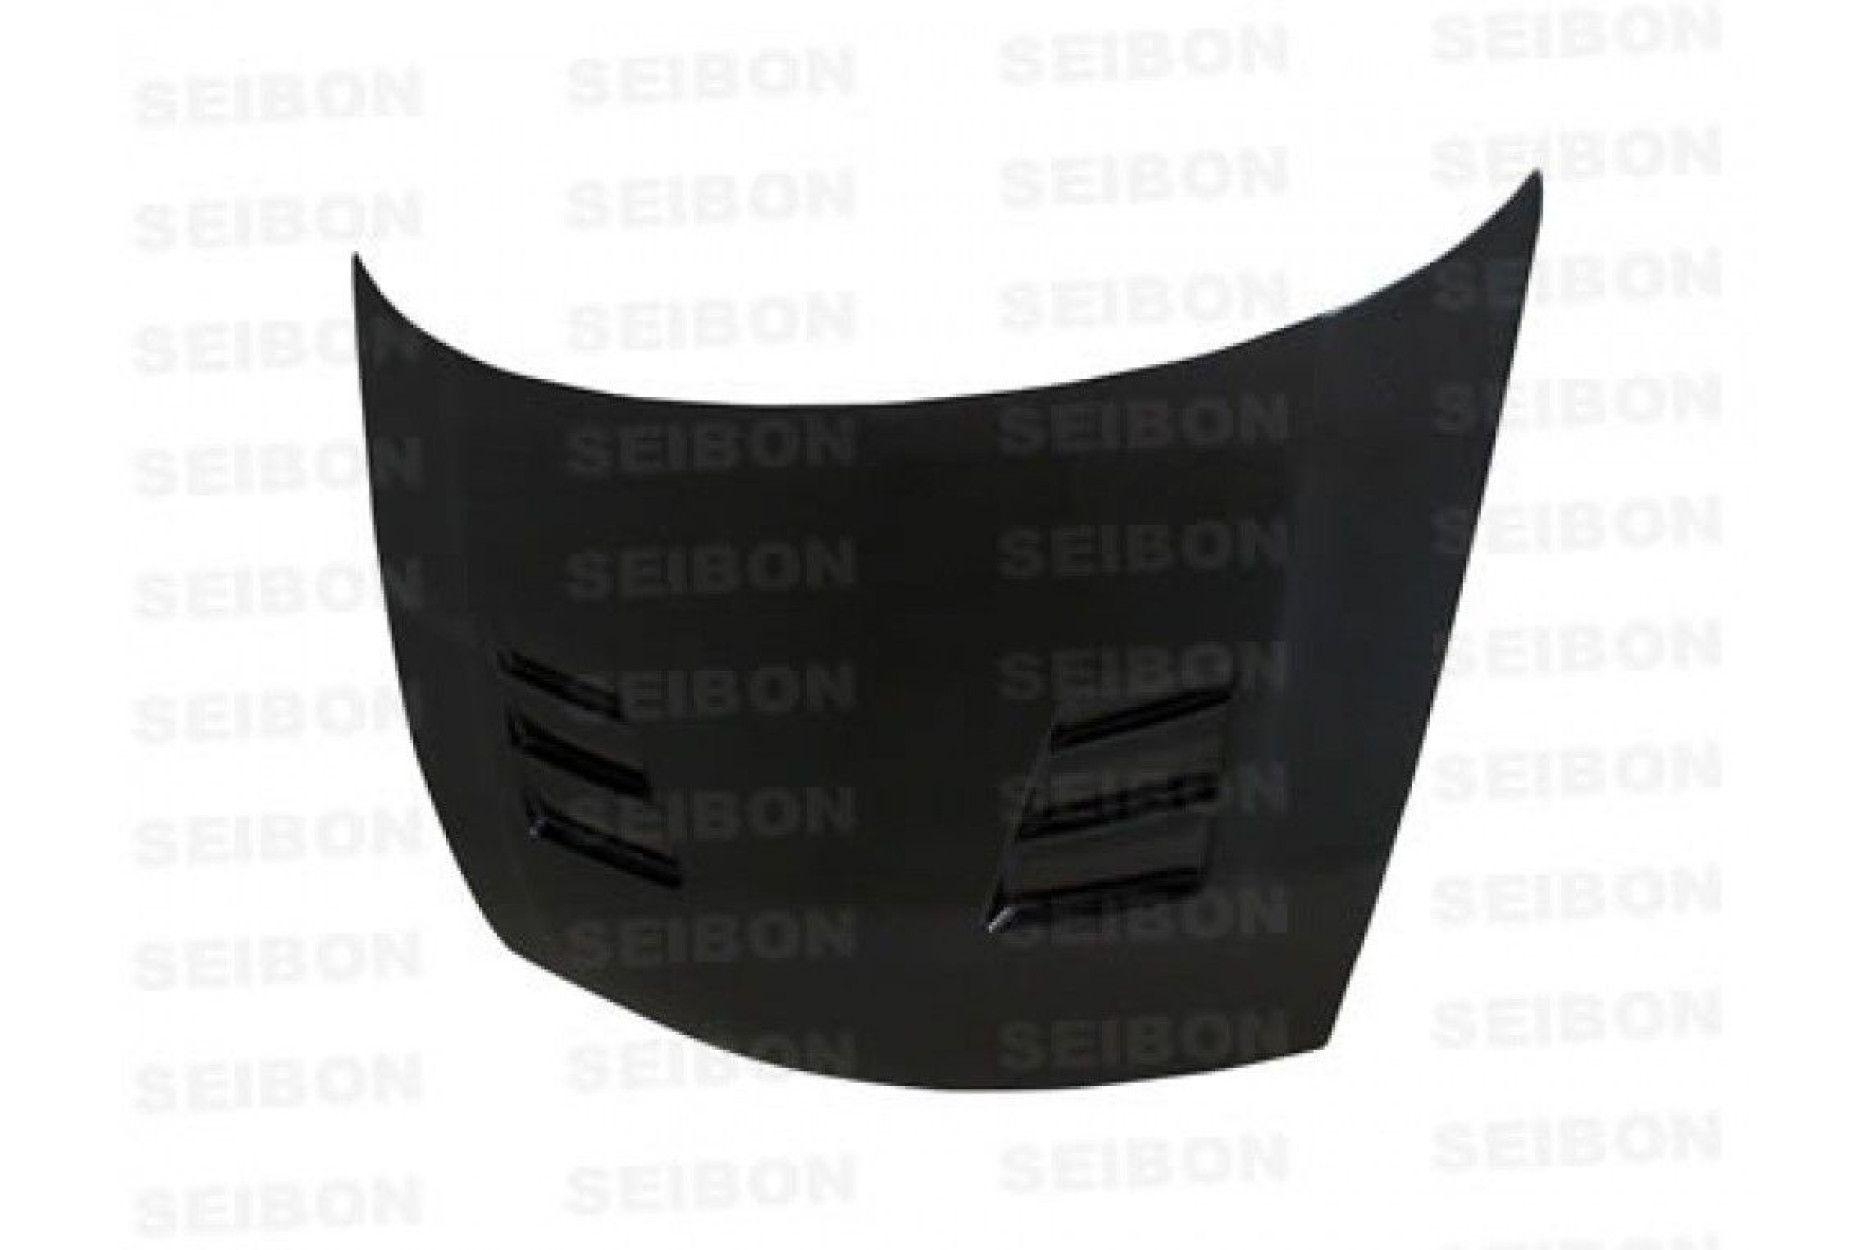 Seibon Carbon Motorhaube für Honda Civic FD1|FD3|FD2|FD5 2006 - 2010 4D JDM & Acura CSX TS-Style